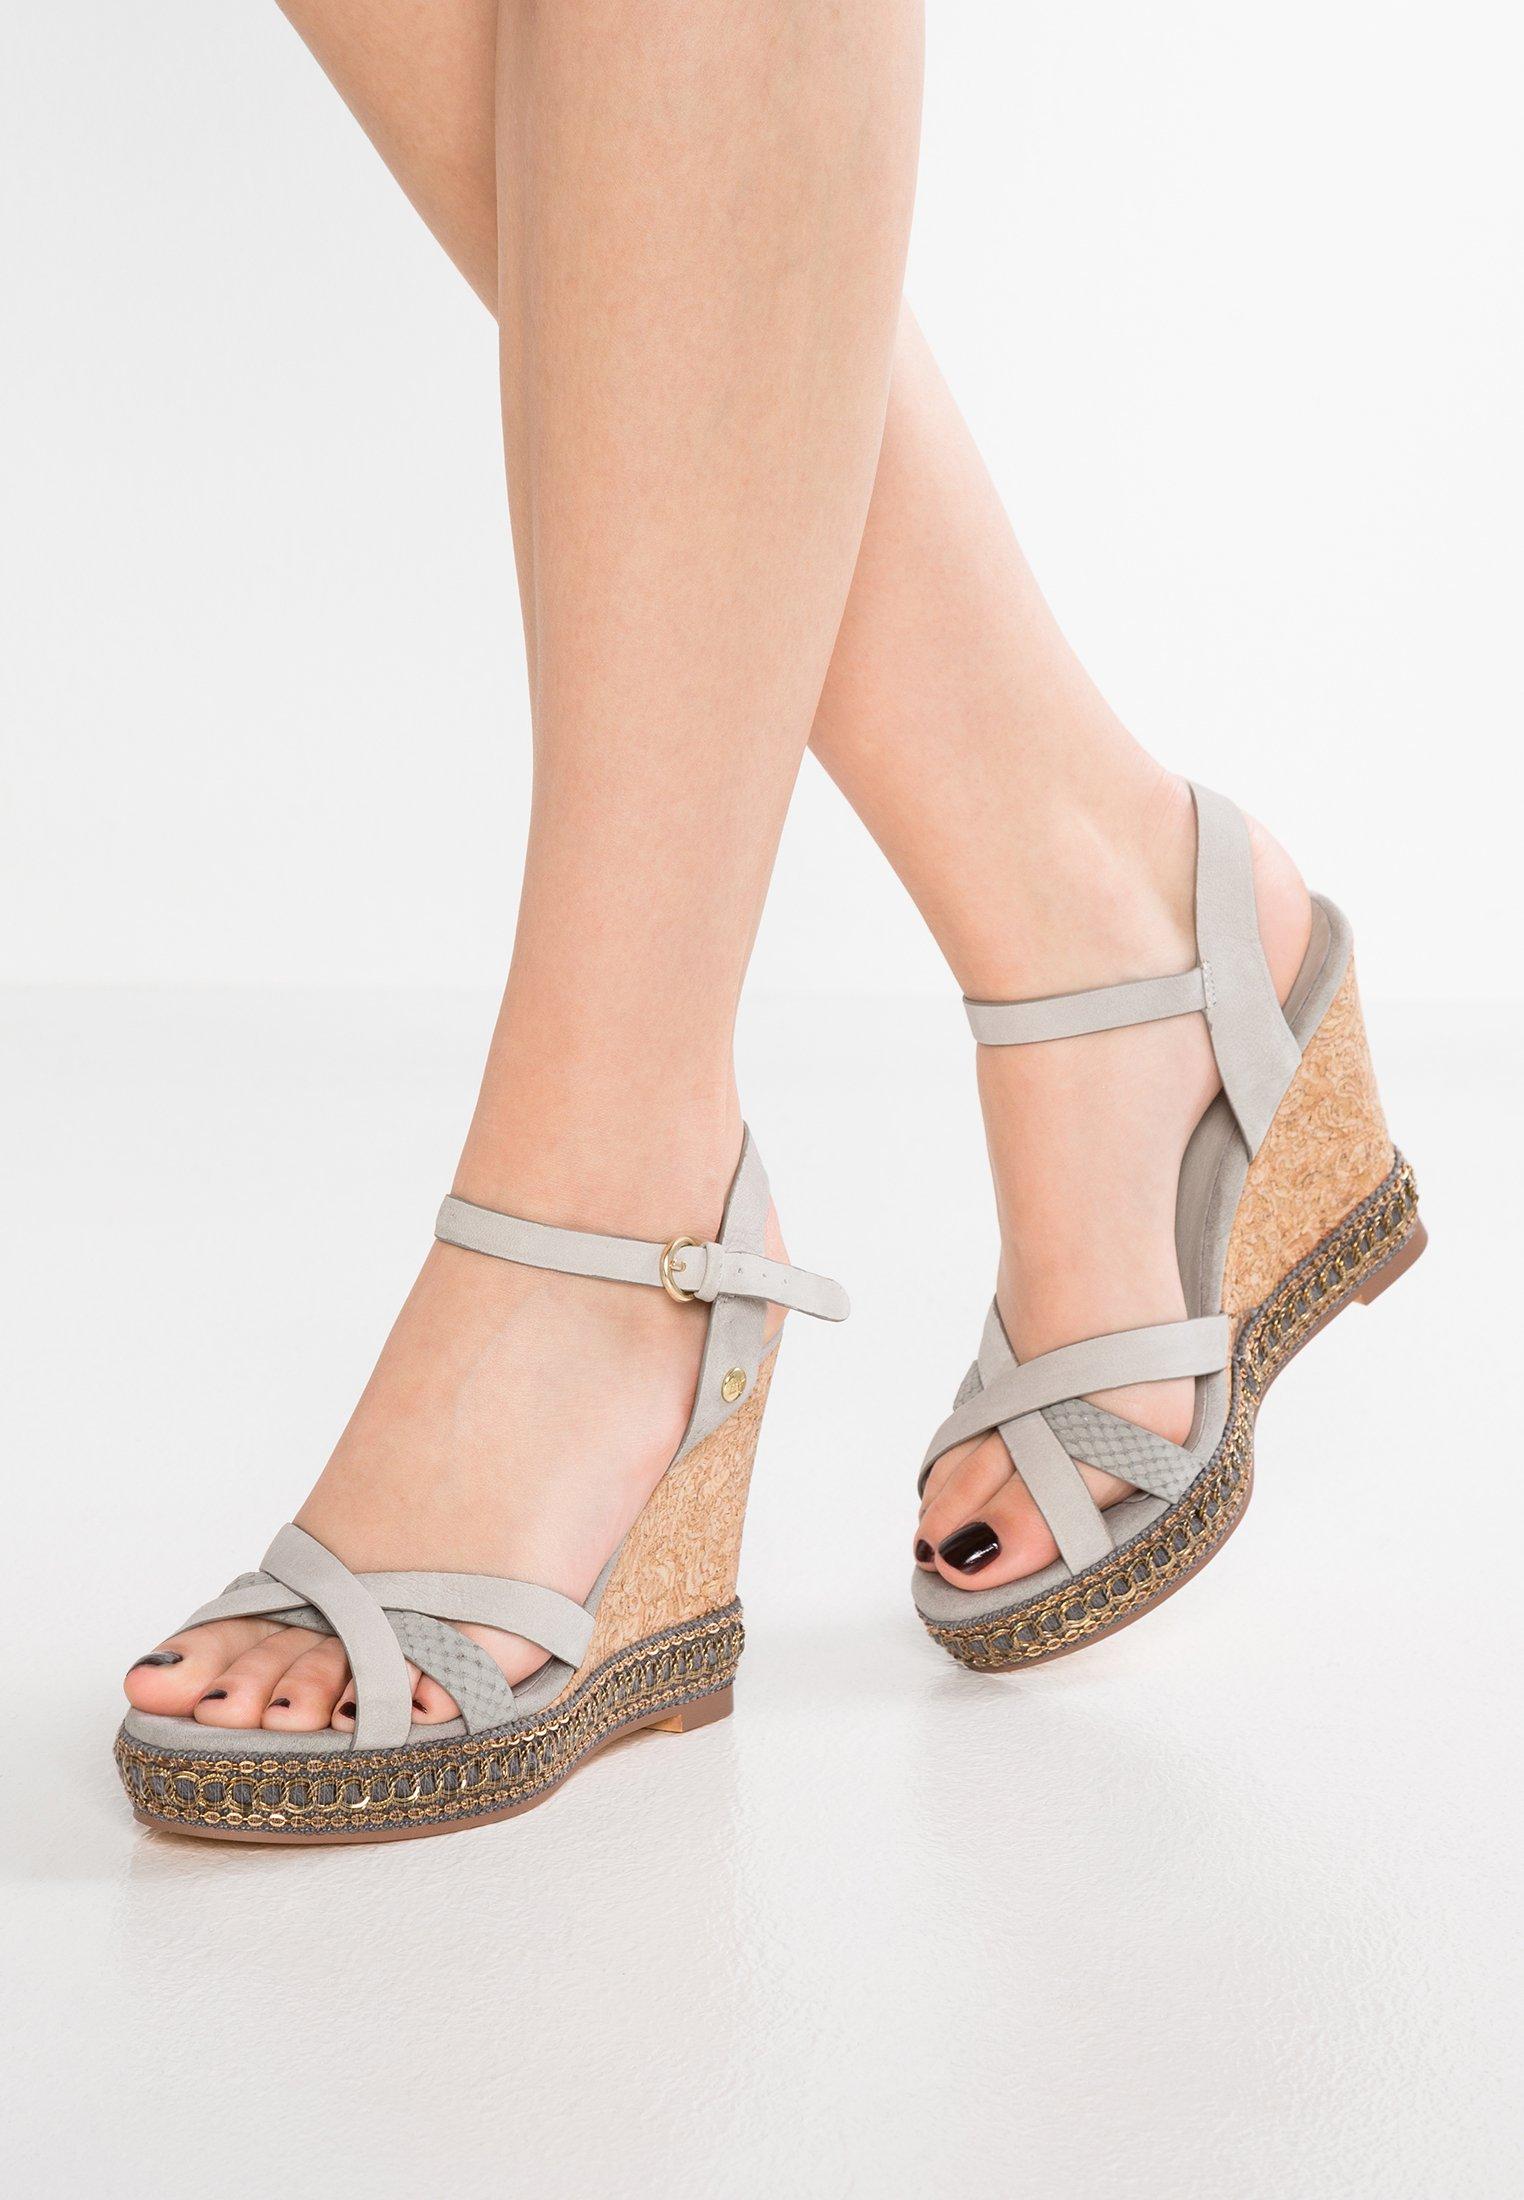 Sandales À Bv Dna HautsGrey Talons Footwear txhQsrdC